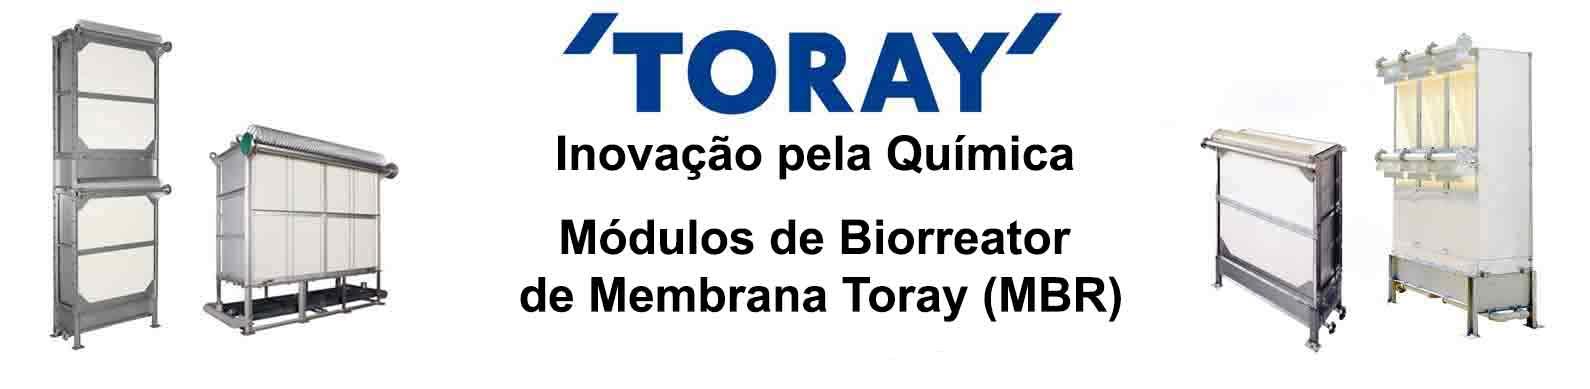 modulos-de-biorreactor-de-membrana-toray-mbr.jpg